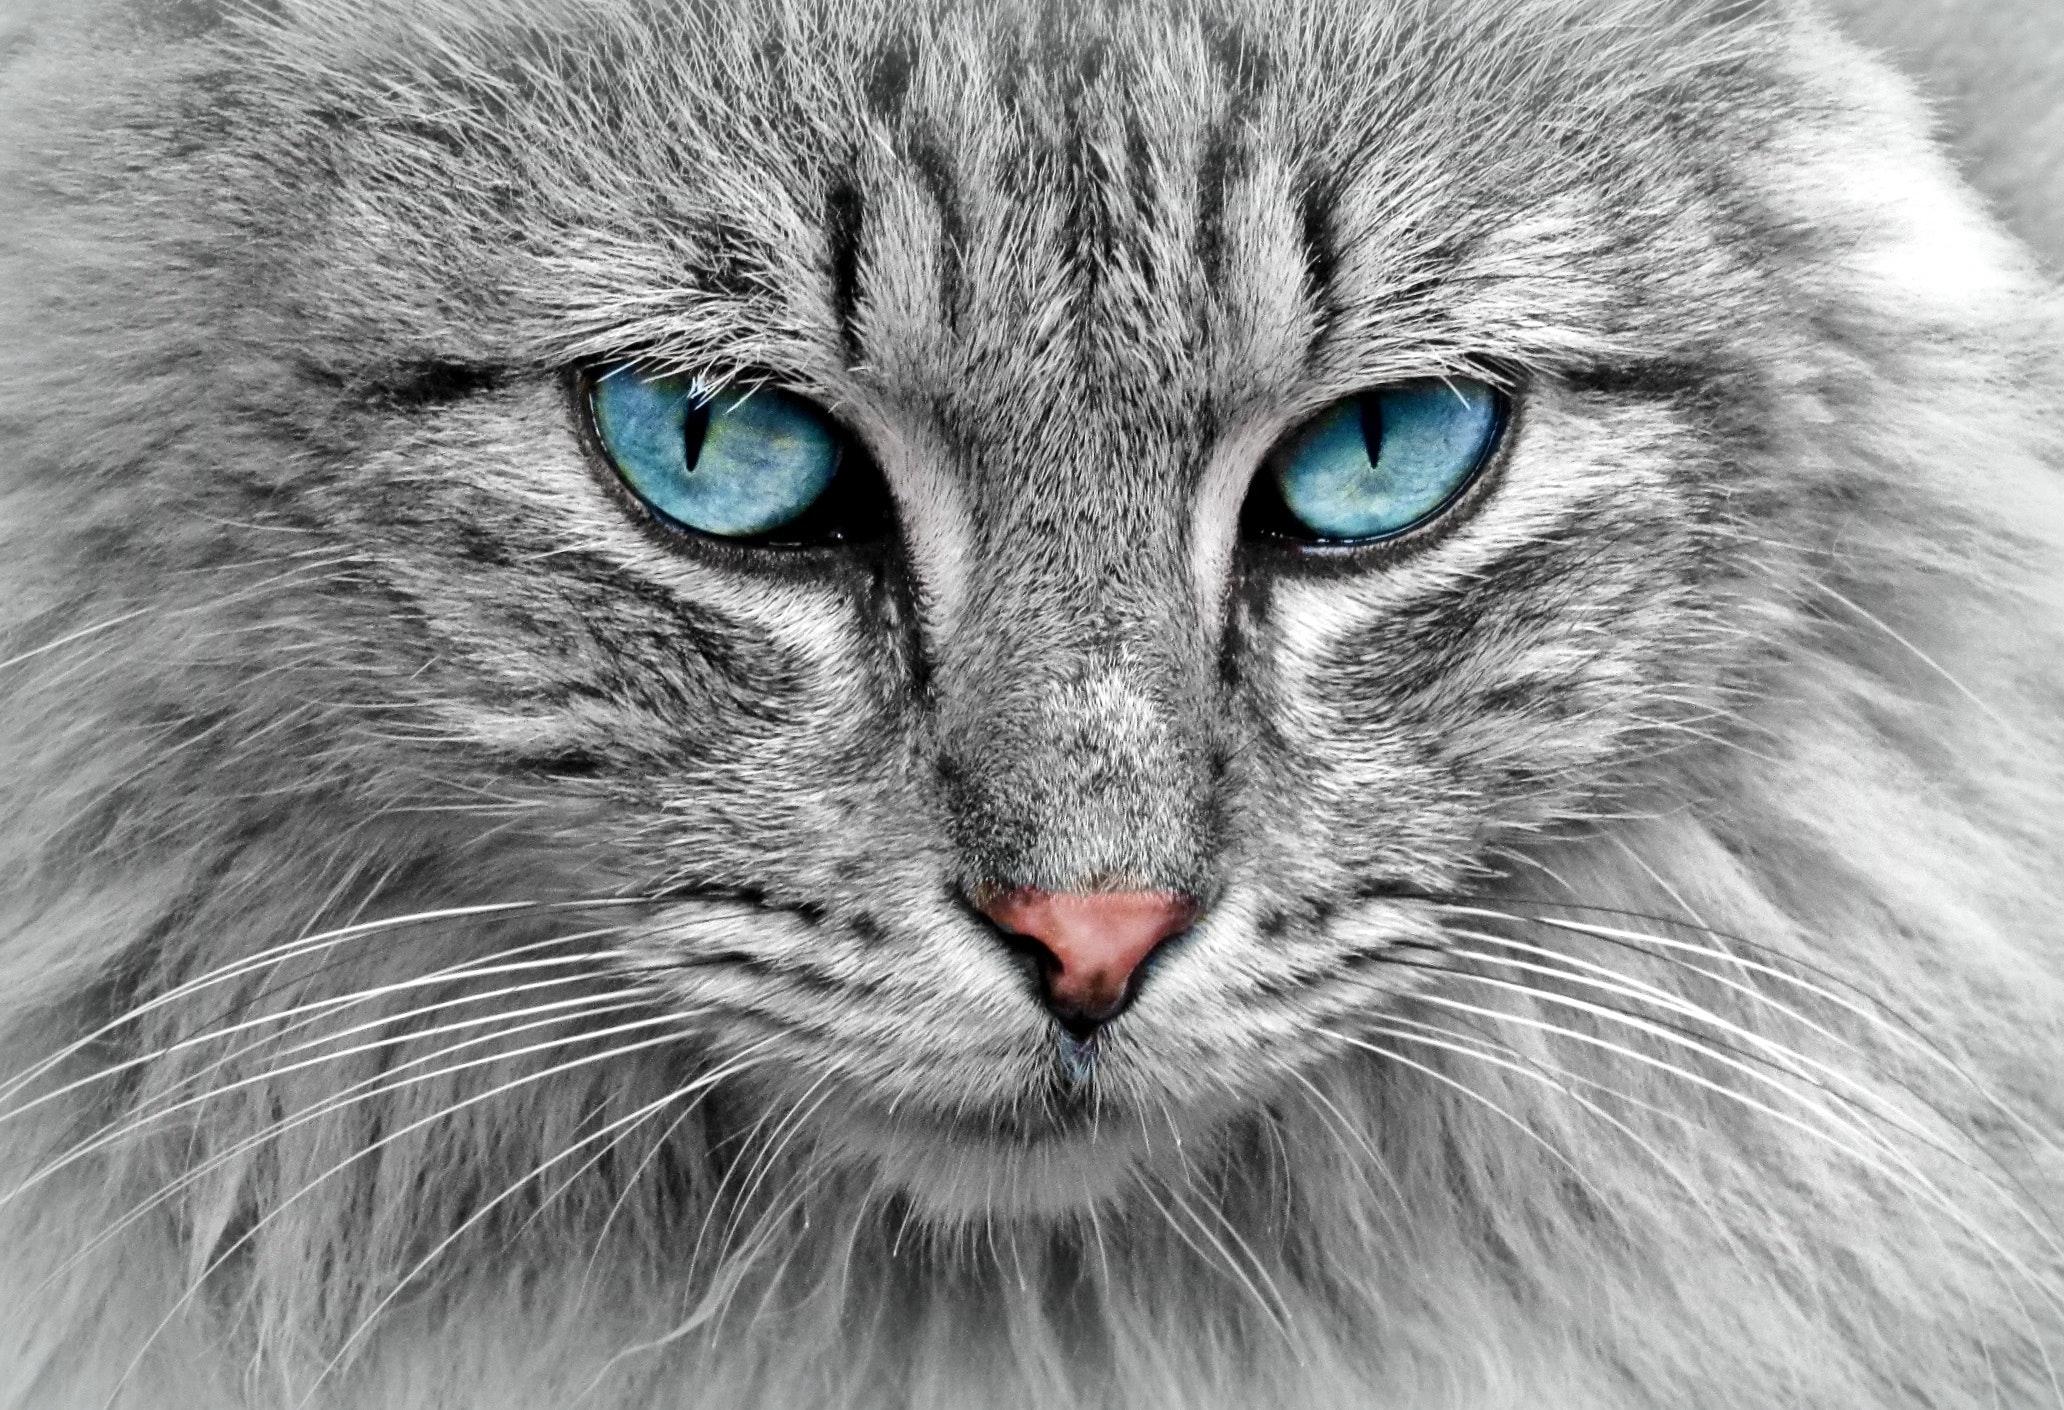 animal-cat-eyes-33537